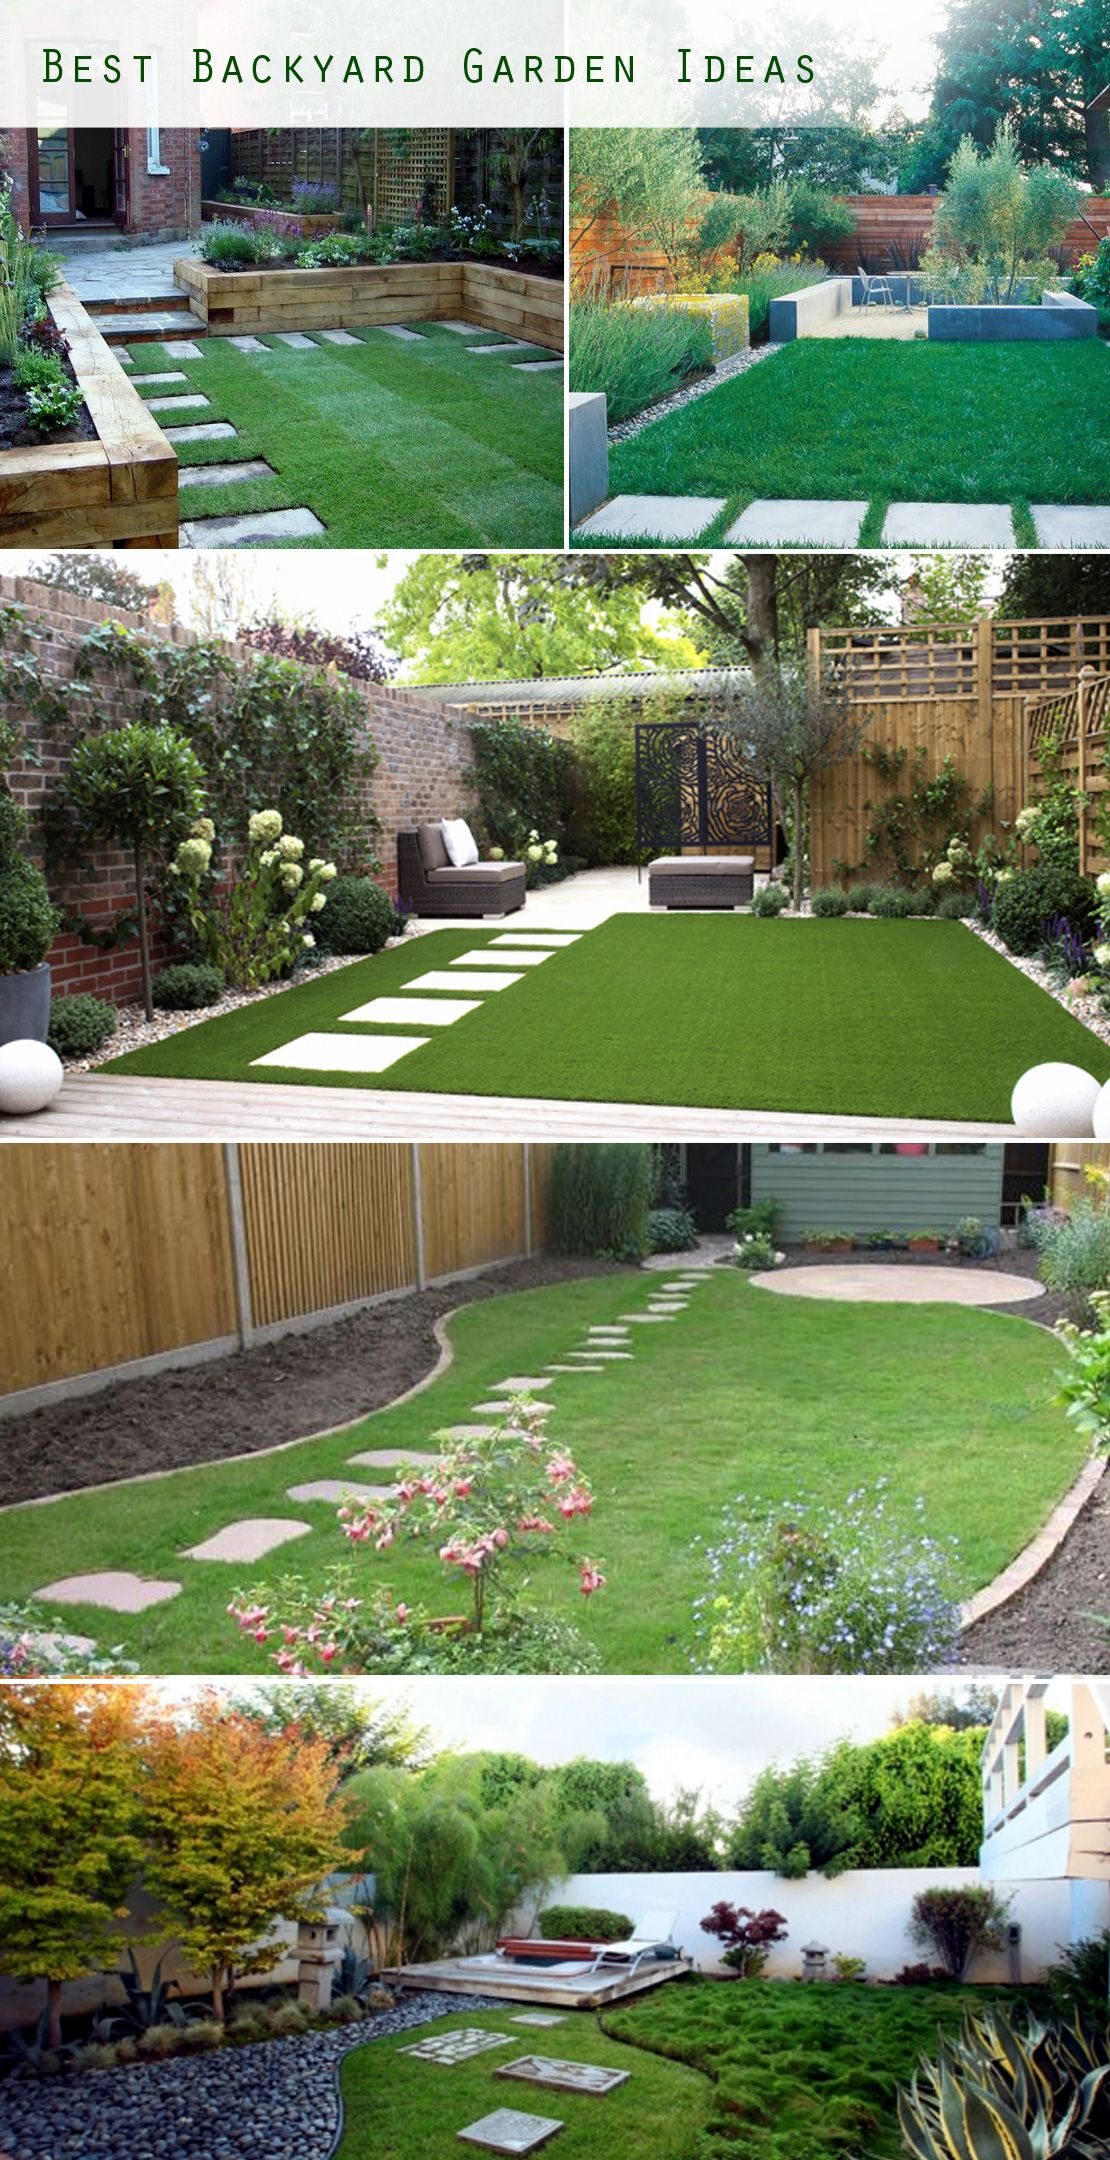 Fantastic Backyard Design And Ideas On A Budget Anifa Blog Frontyard La Backyard Garden Landscape Garden Design Layout Landscaping Garden Landscape Design How to landscape a backyard garden